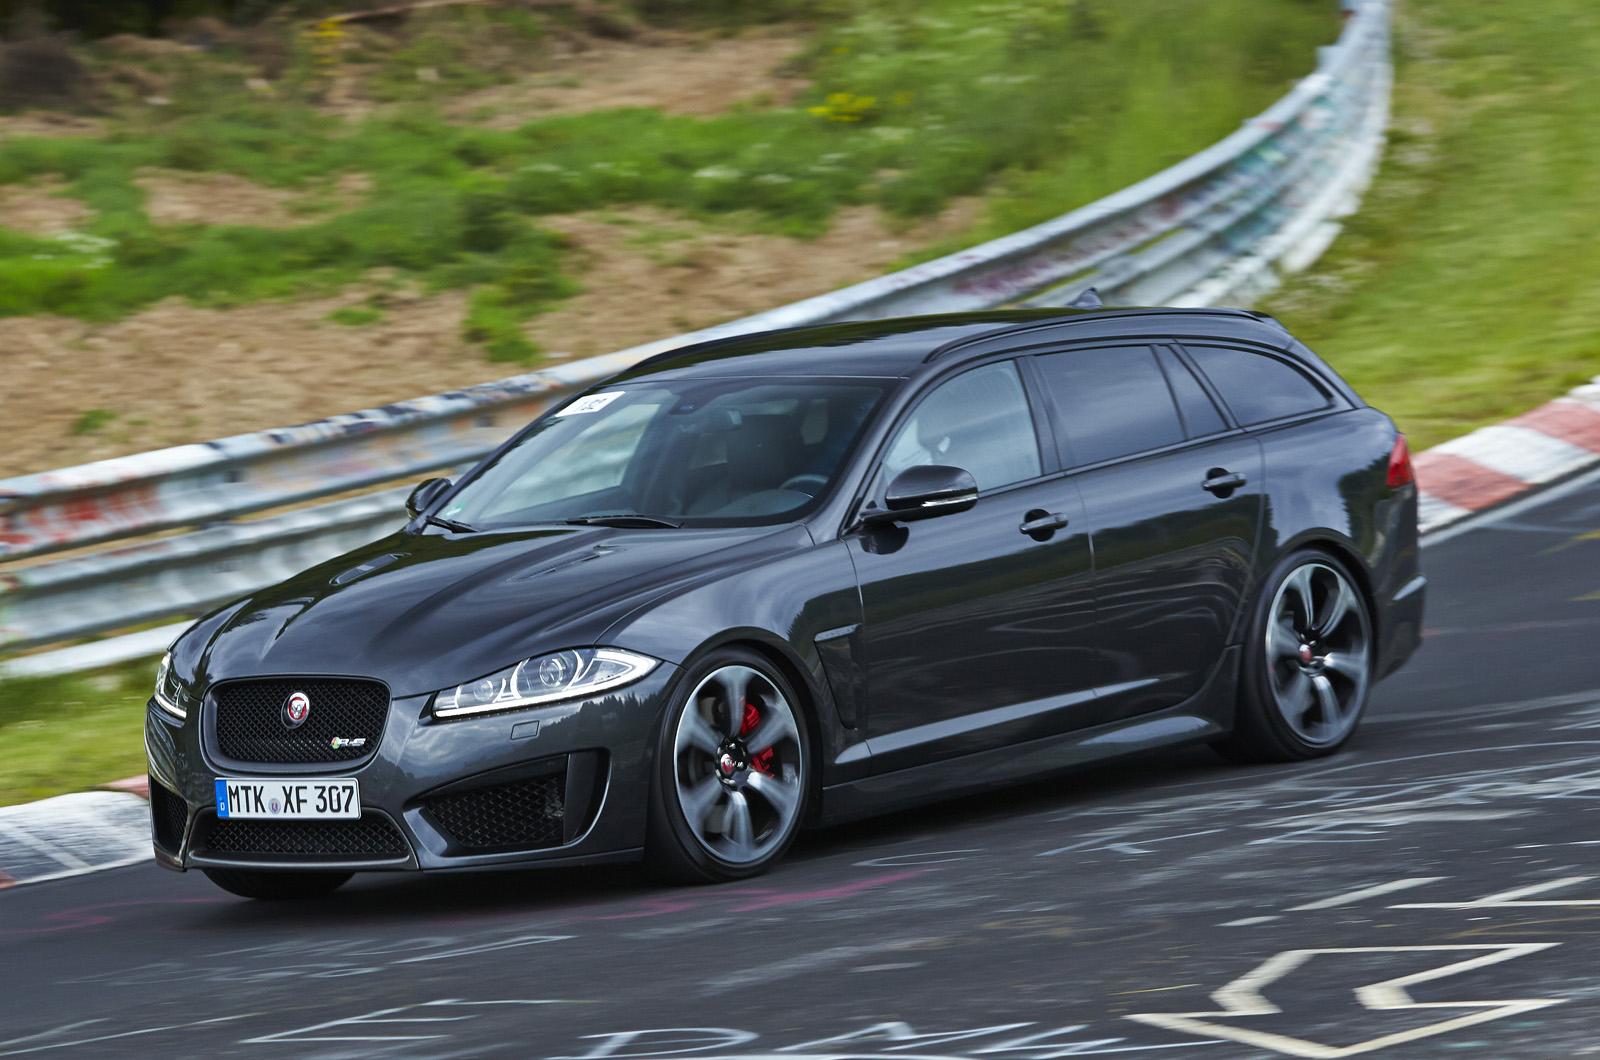 Jaguar xfr s sportbrake - photo#13